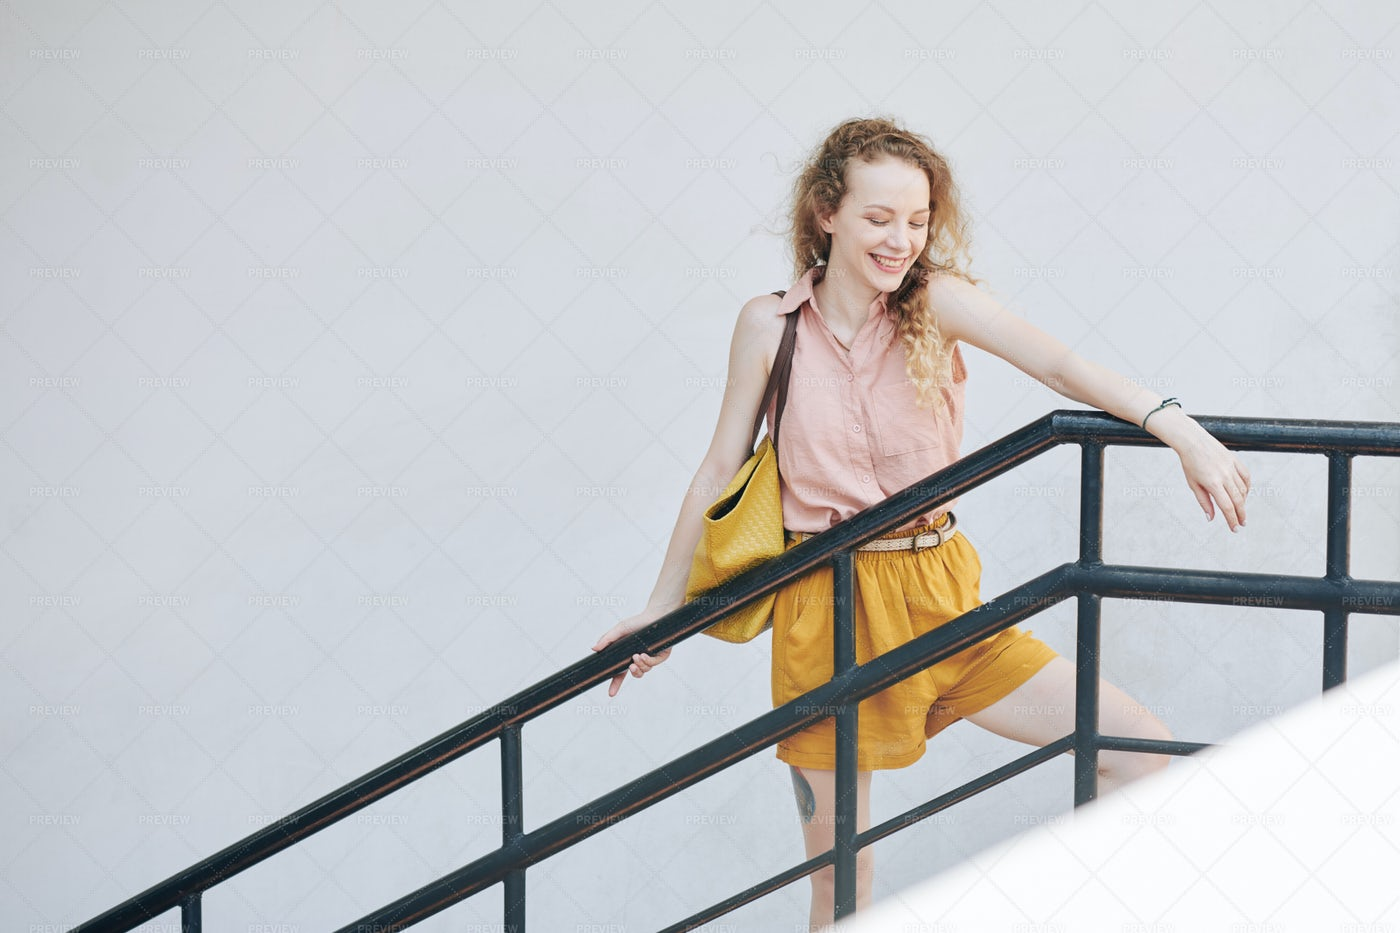 Happy Girl On Staircase: Stock Photos